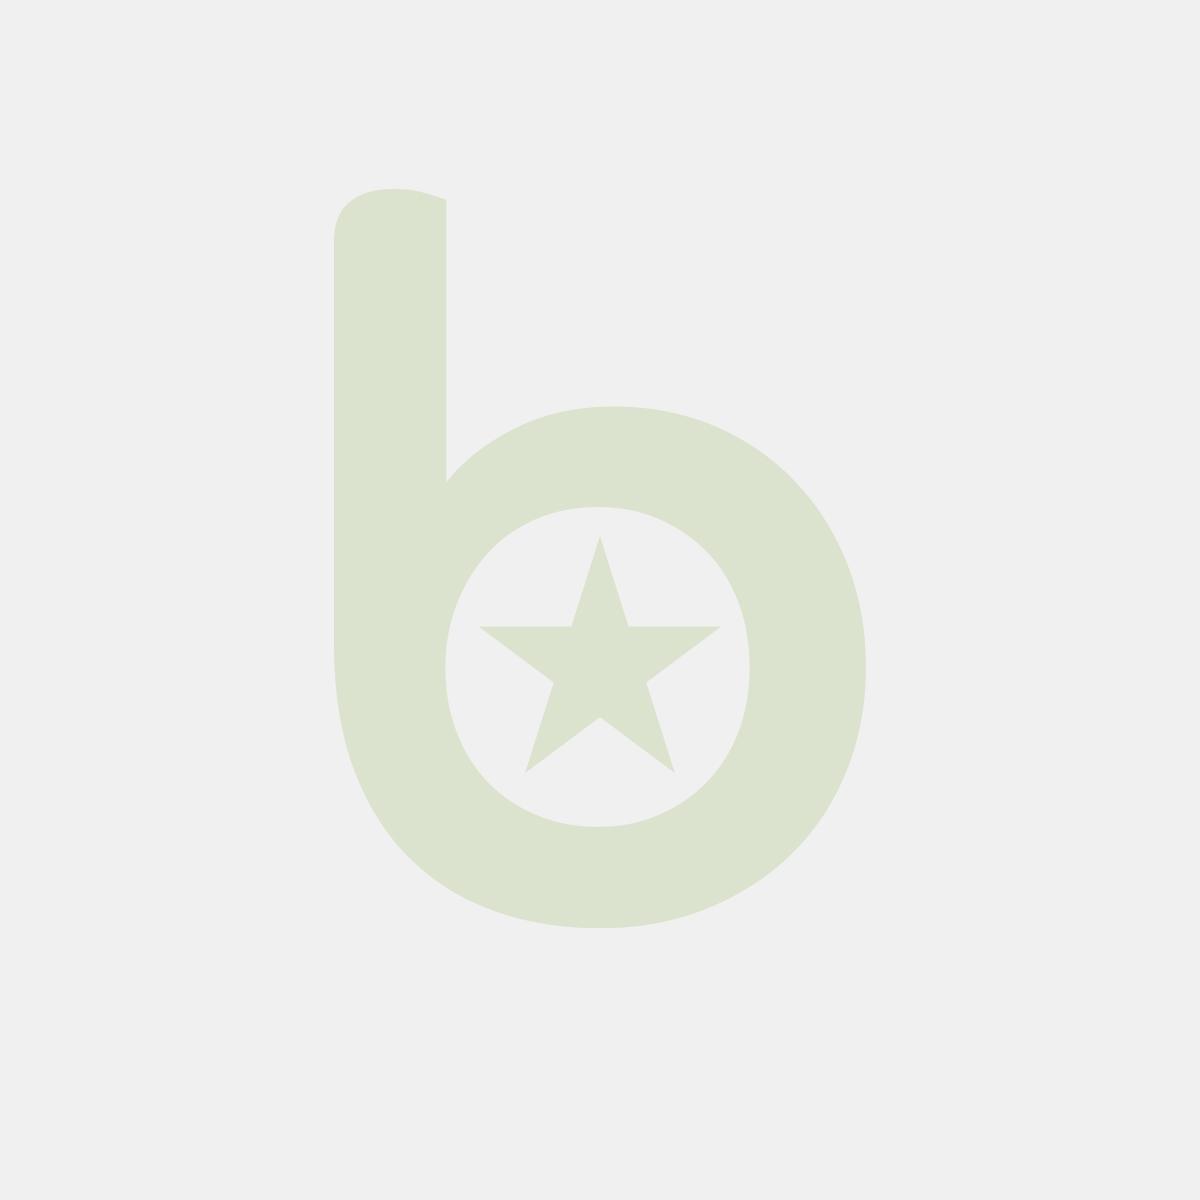 Bloczek samoprzylepny POST-IT® (653CY-VP20), 38x51mm, (16+4)x100 kart., żółte, 4 bloczki GRATIS